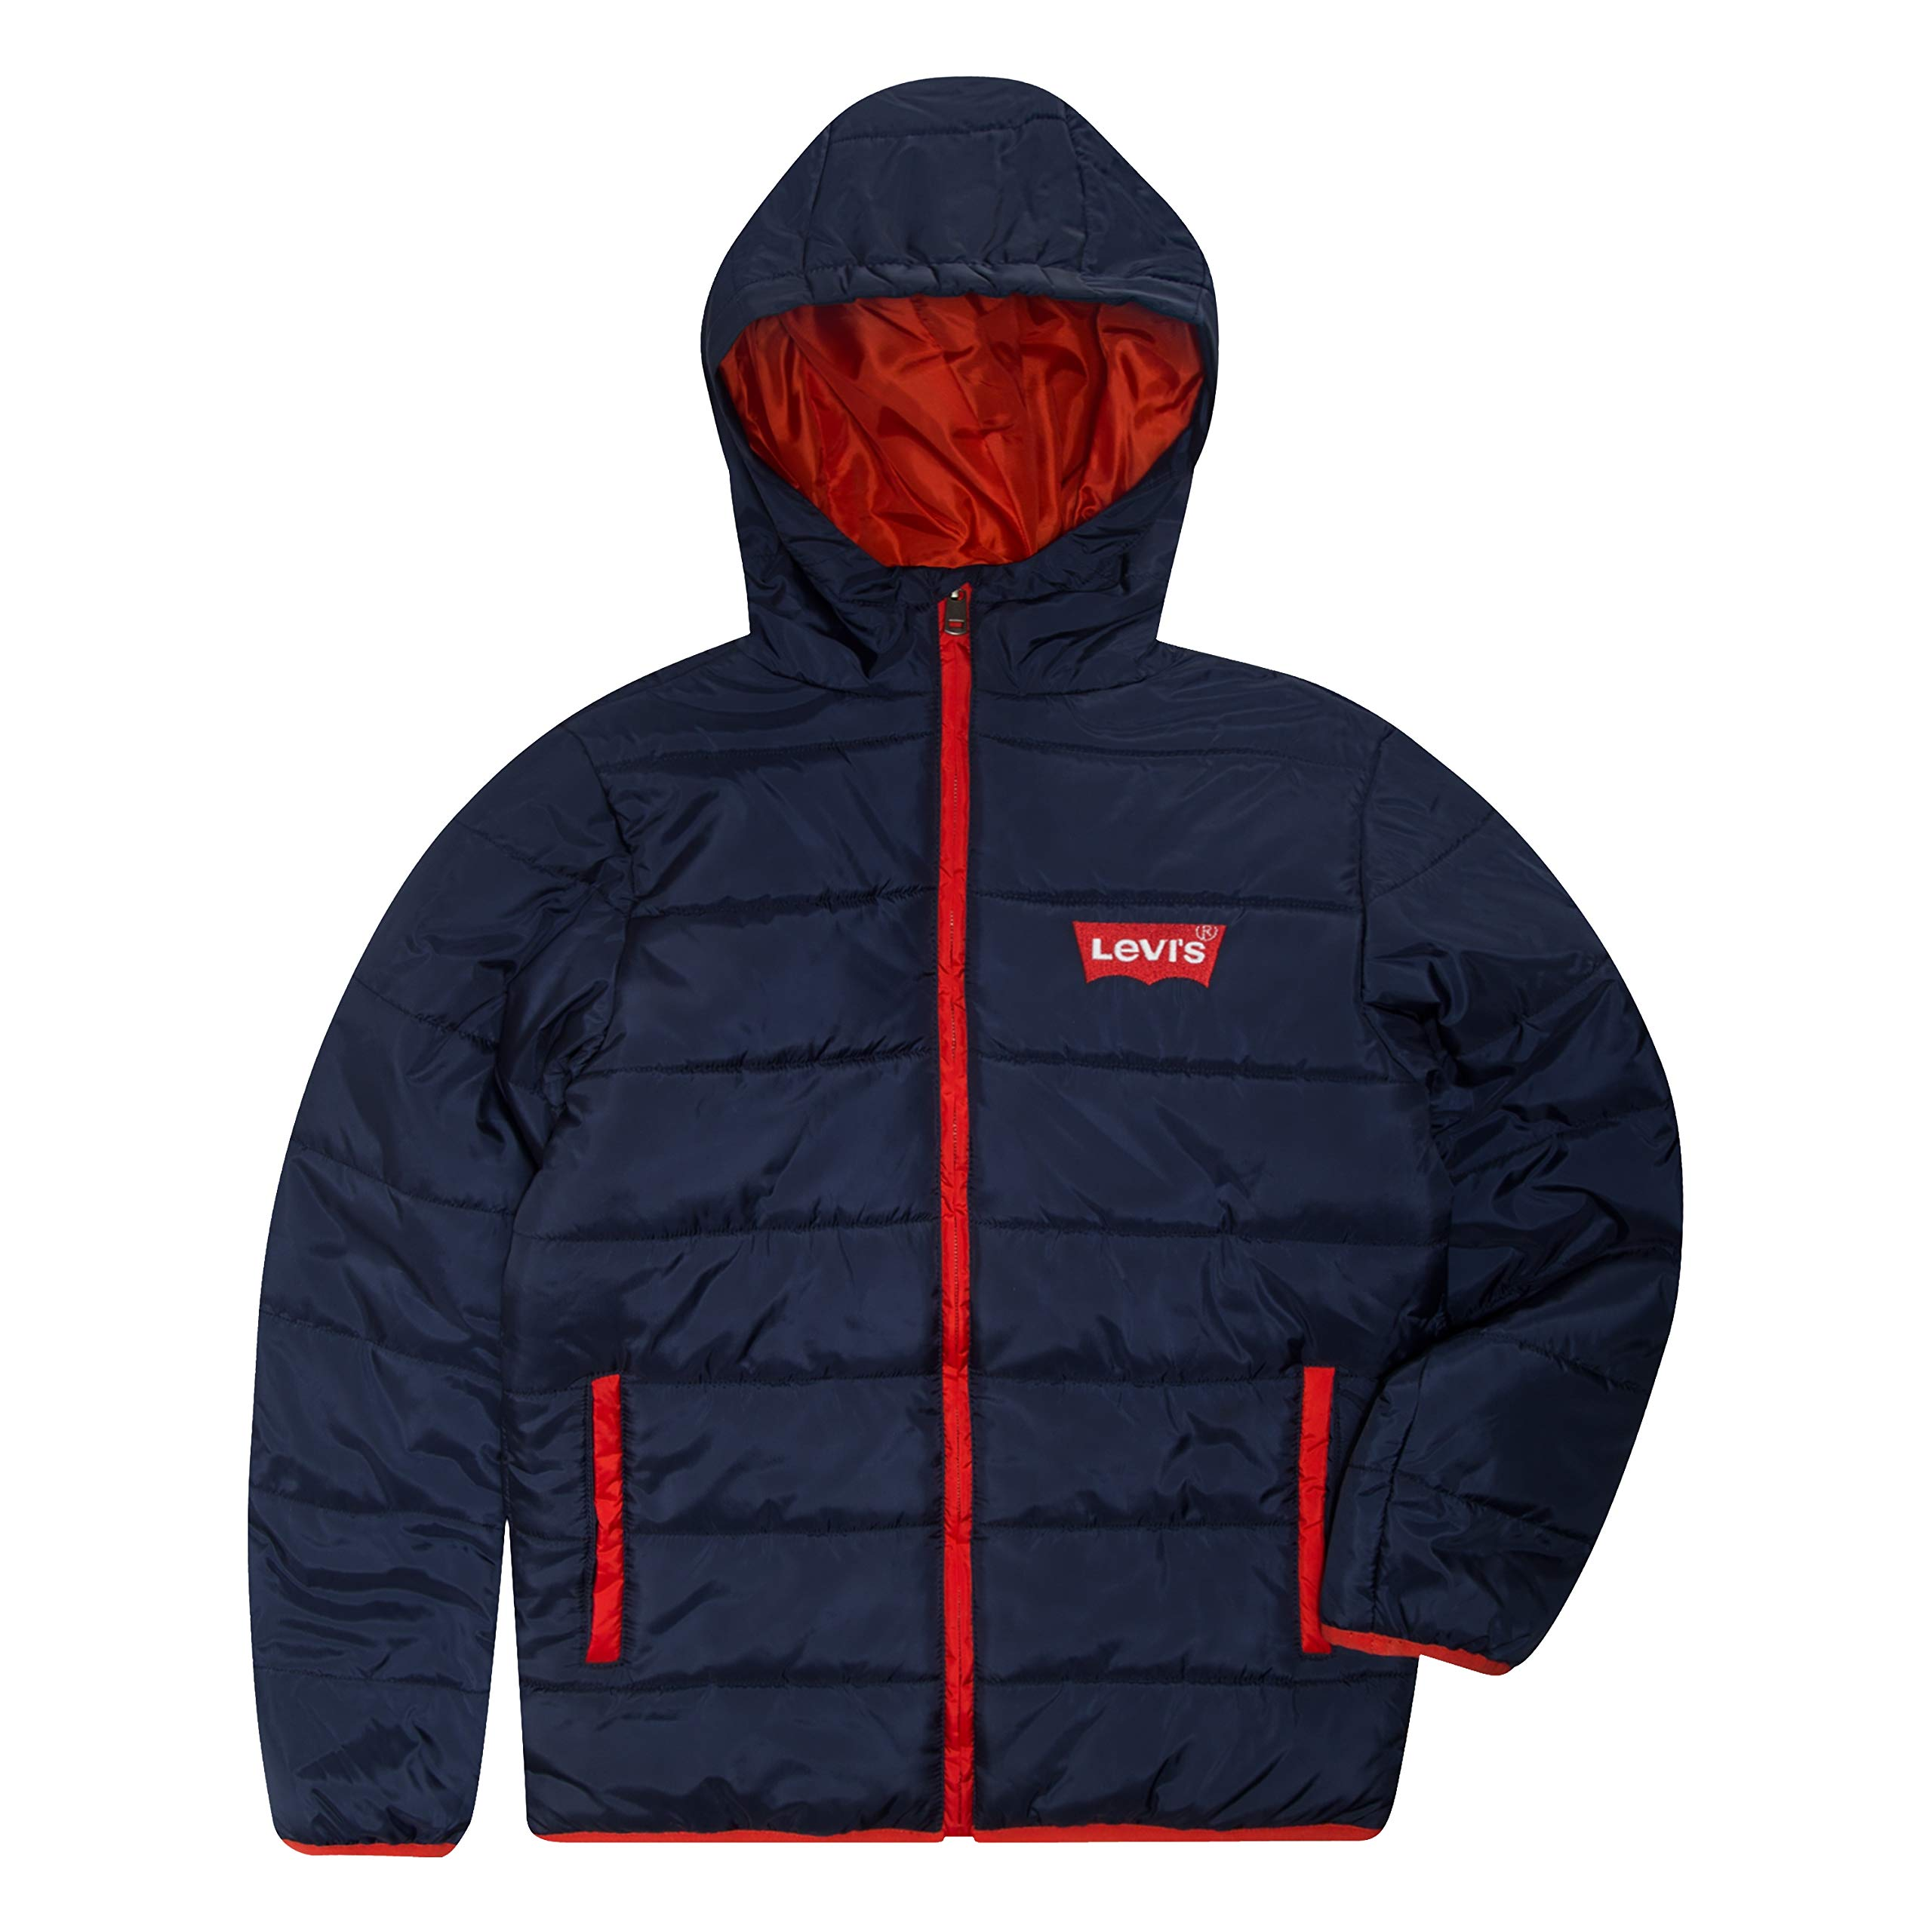 Levi's Boys' Big Puffer Jacket, Dress Blues/Red S